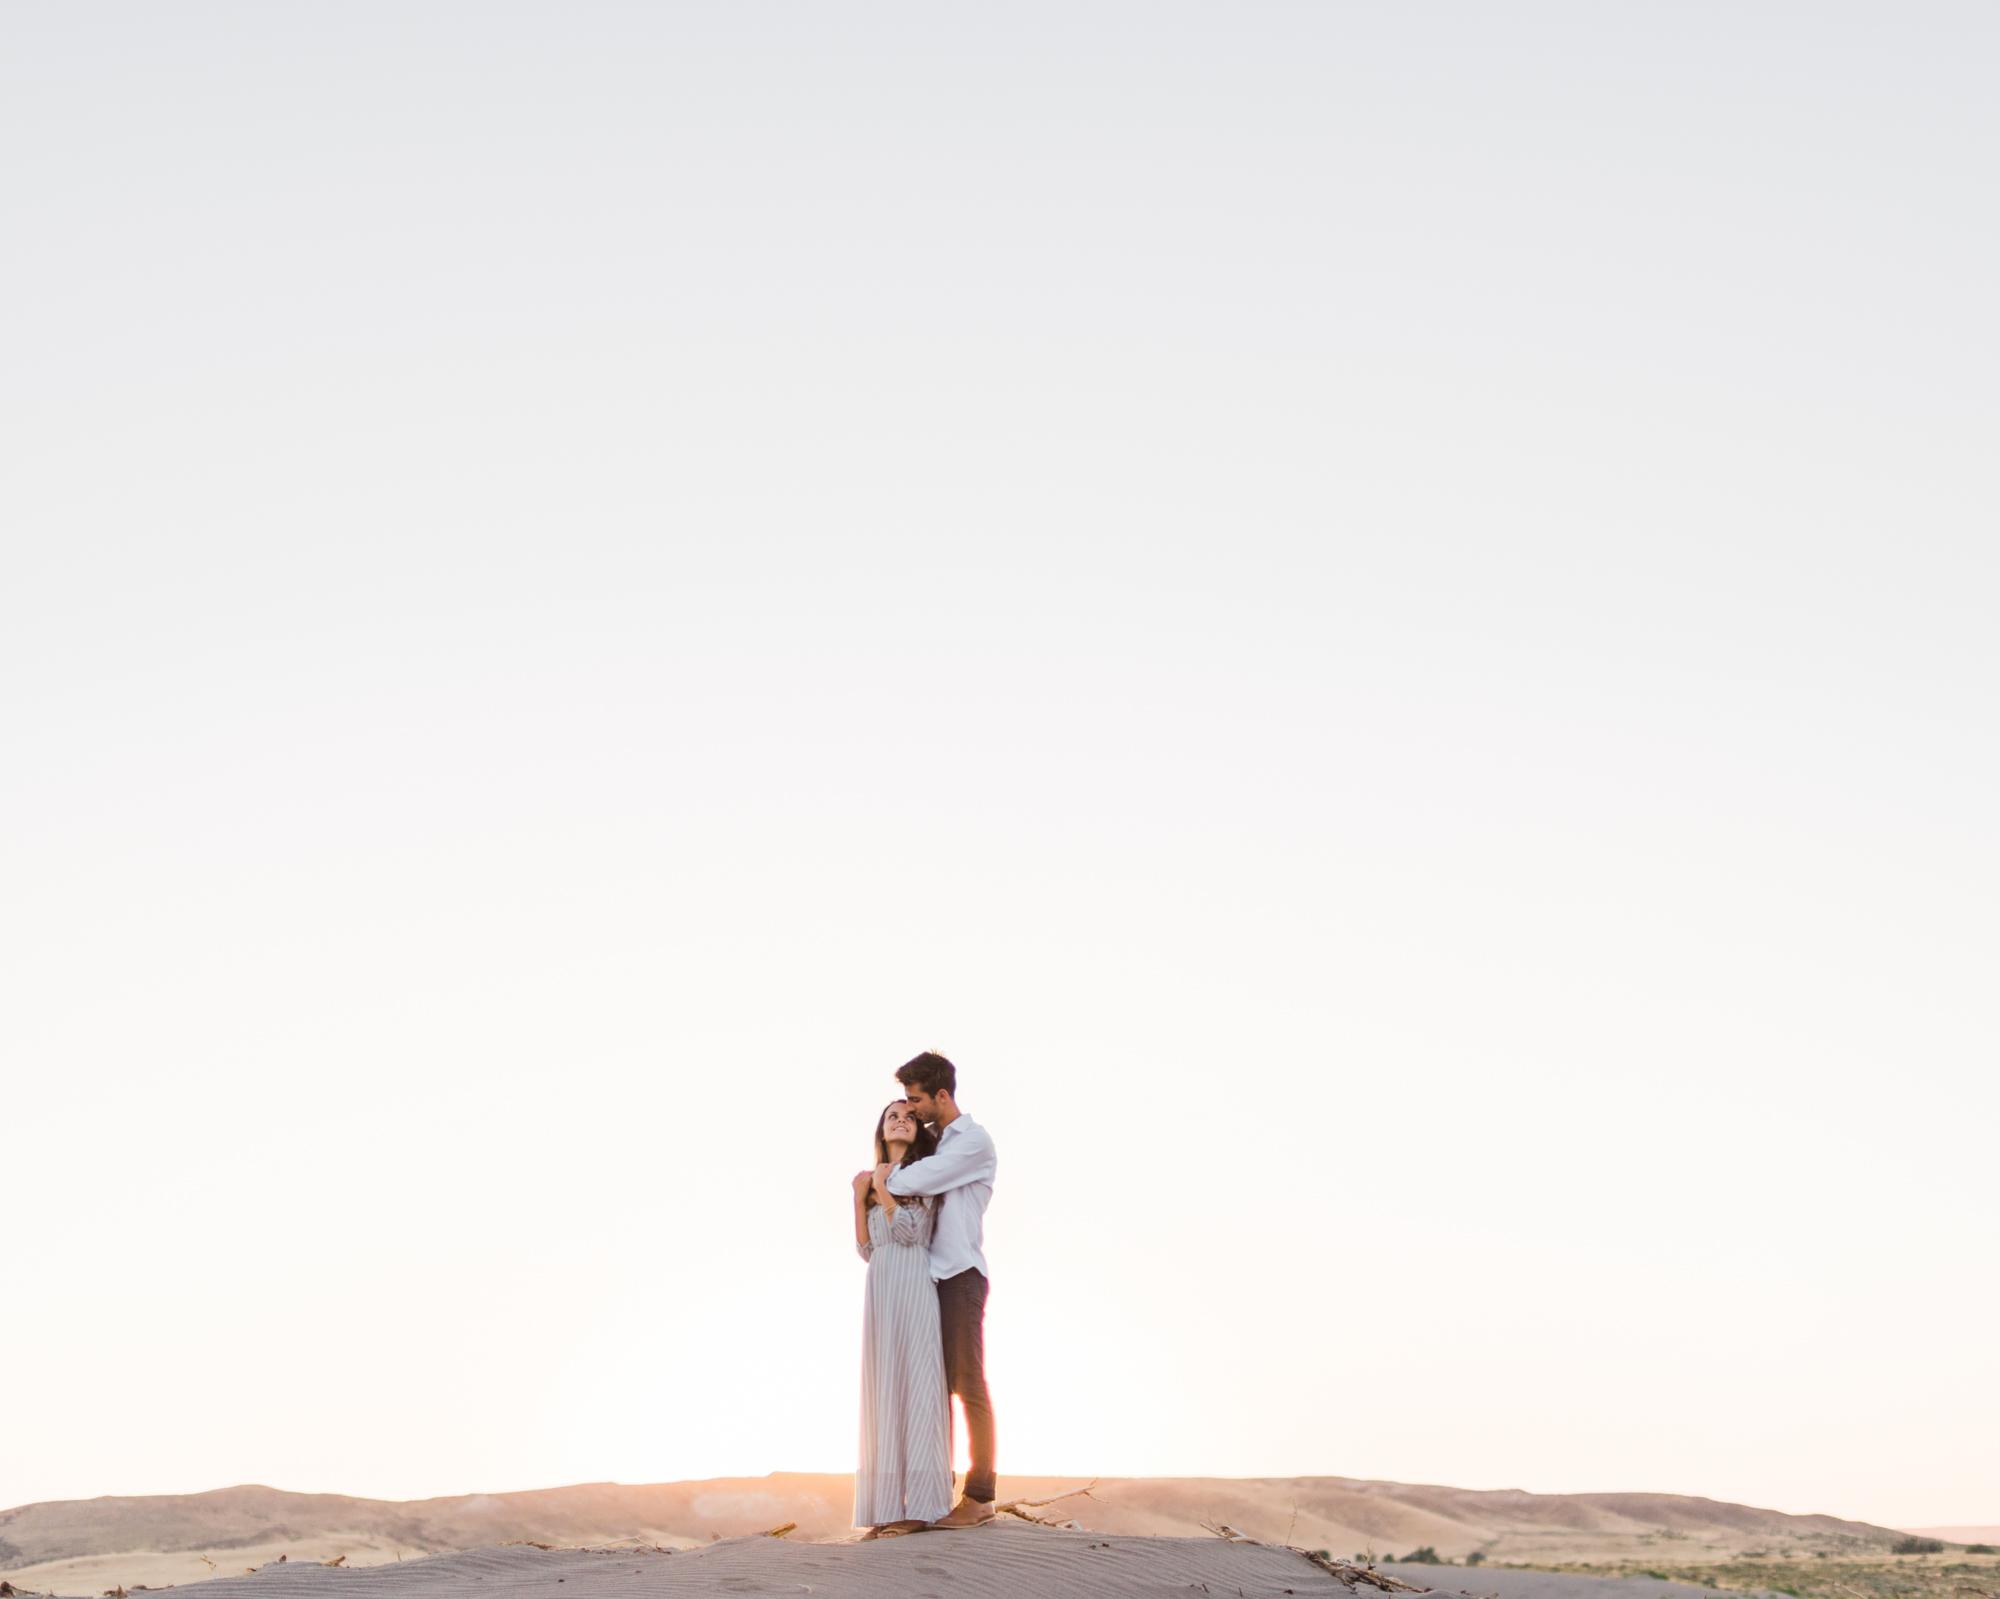 charlotte-charleston-wedding-family-film-destination-photographer-bruneau-sand-dunes-boise-idaho-18.jpg